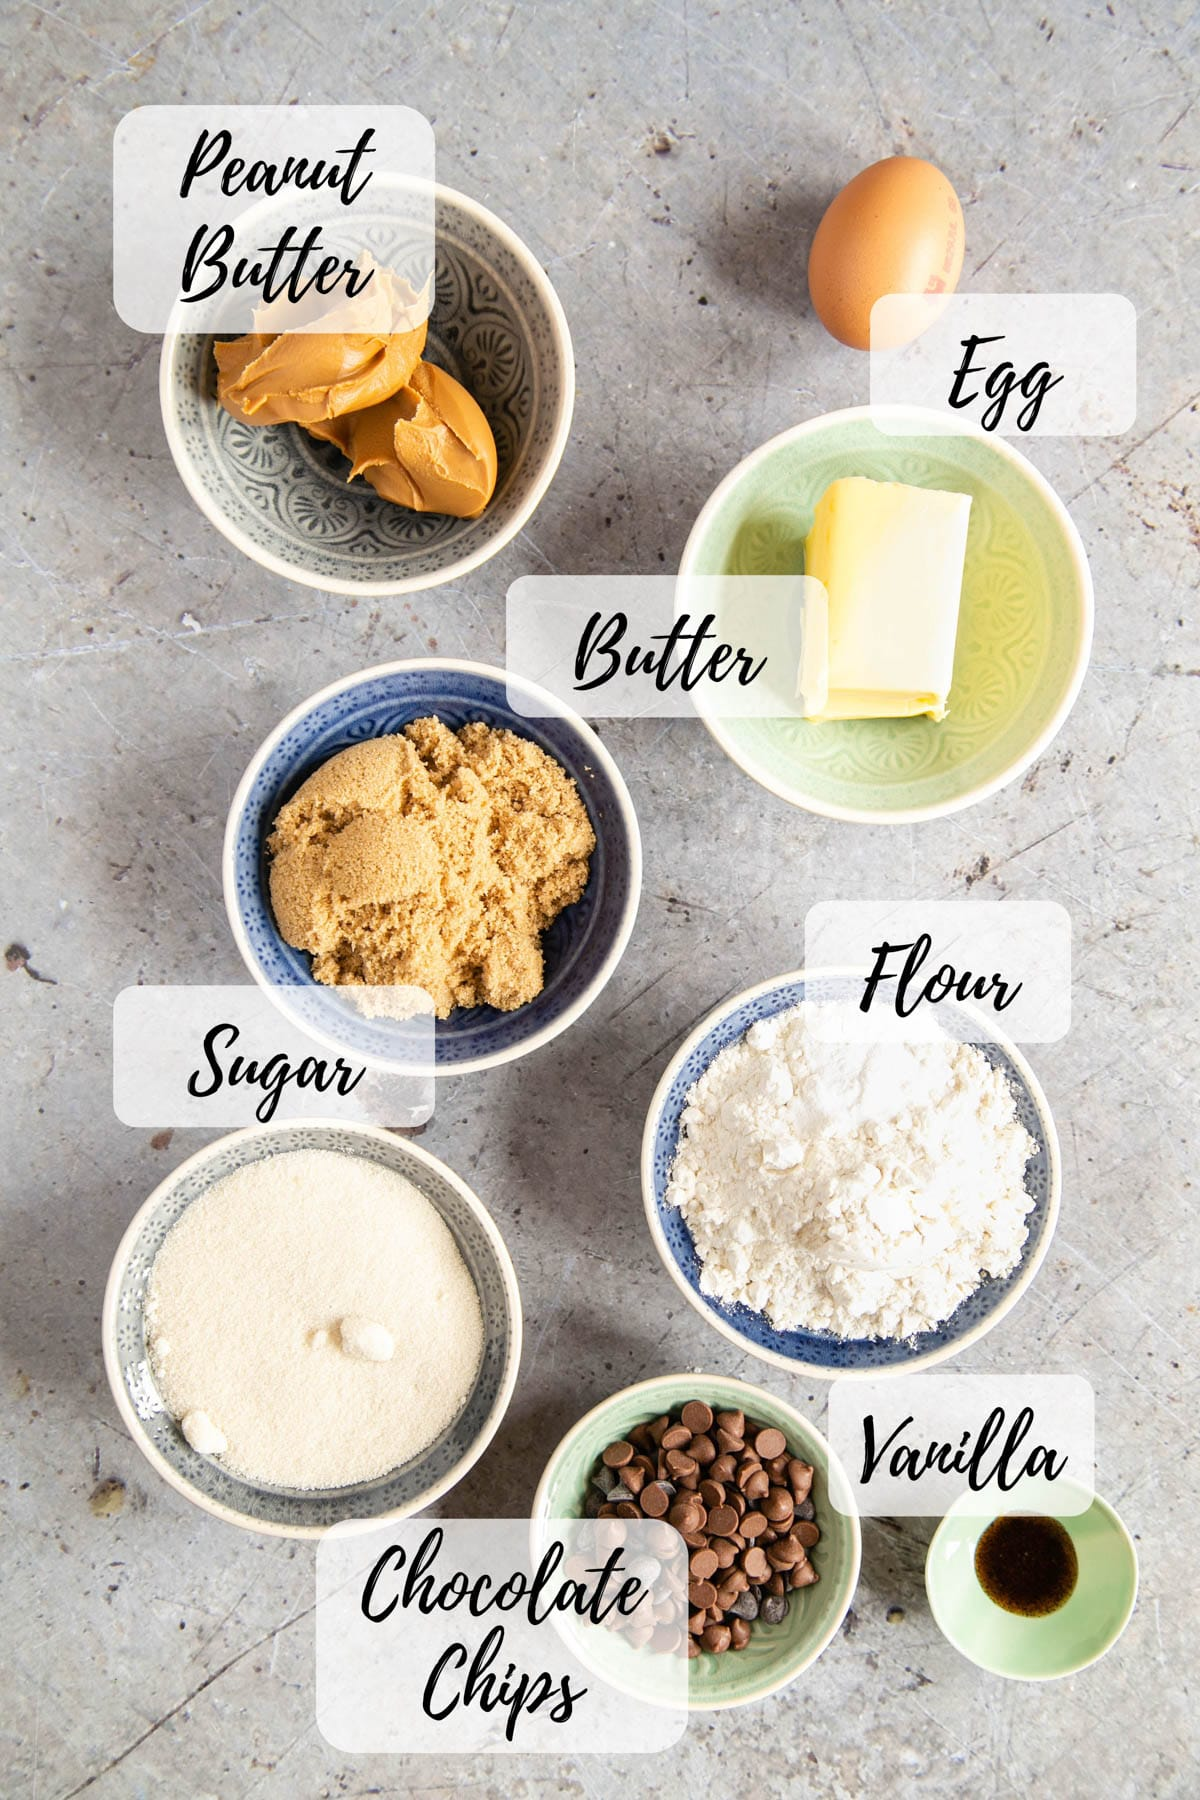 Ingredients for peanut butter blondies: peanut butter, egg, butter, sugar, flour, chocolate chips, vanilla paste